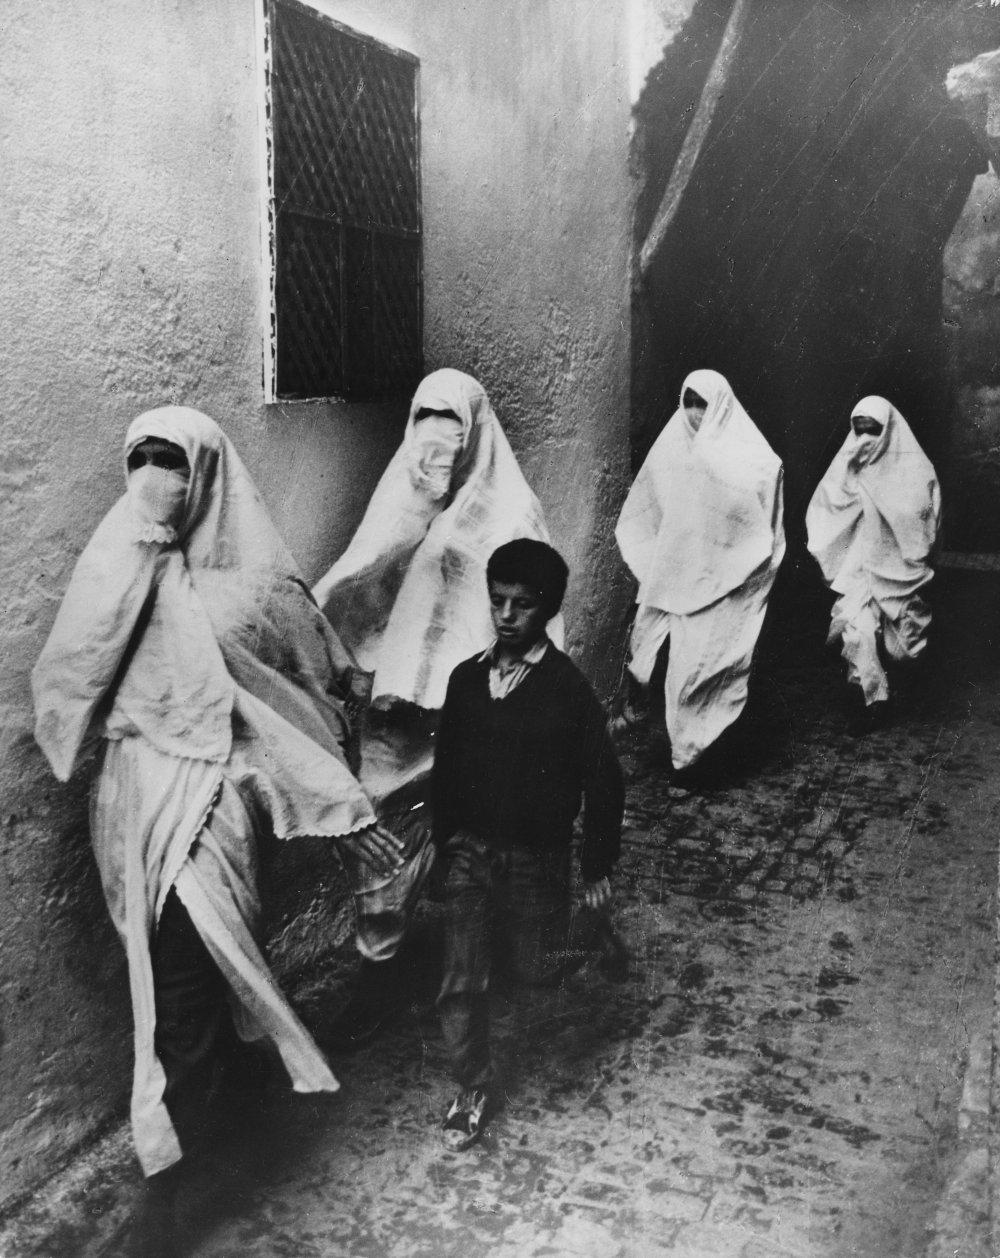 The Battle of Algiers (1965)